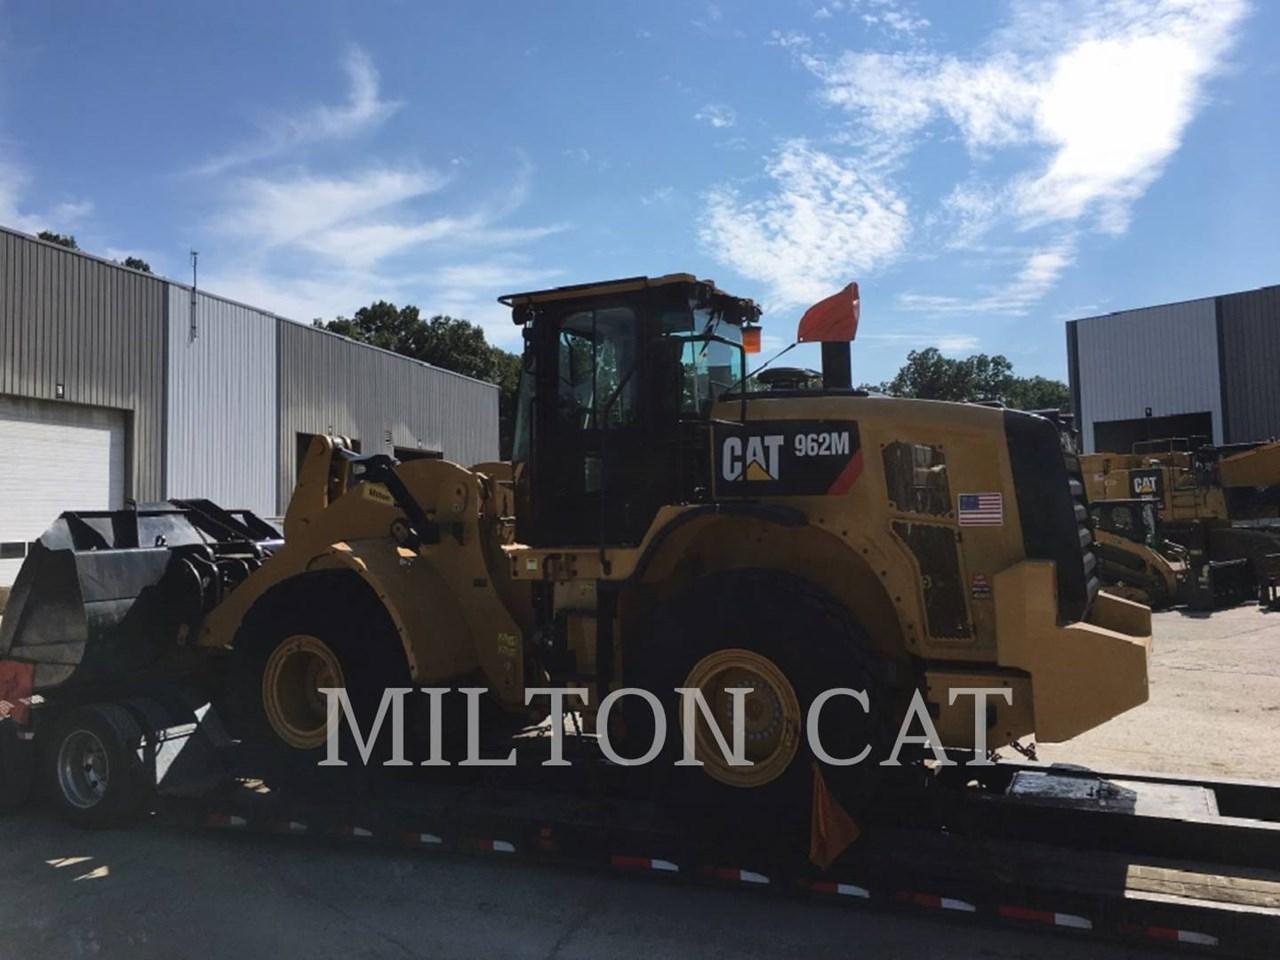 2016 Caterpillar 962M Image 5